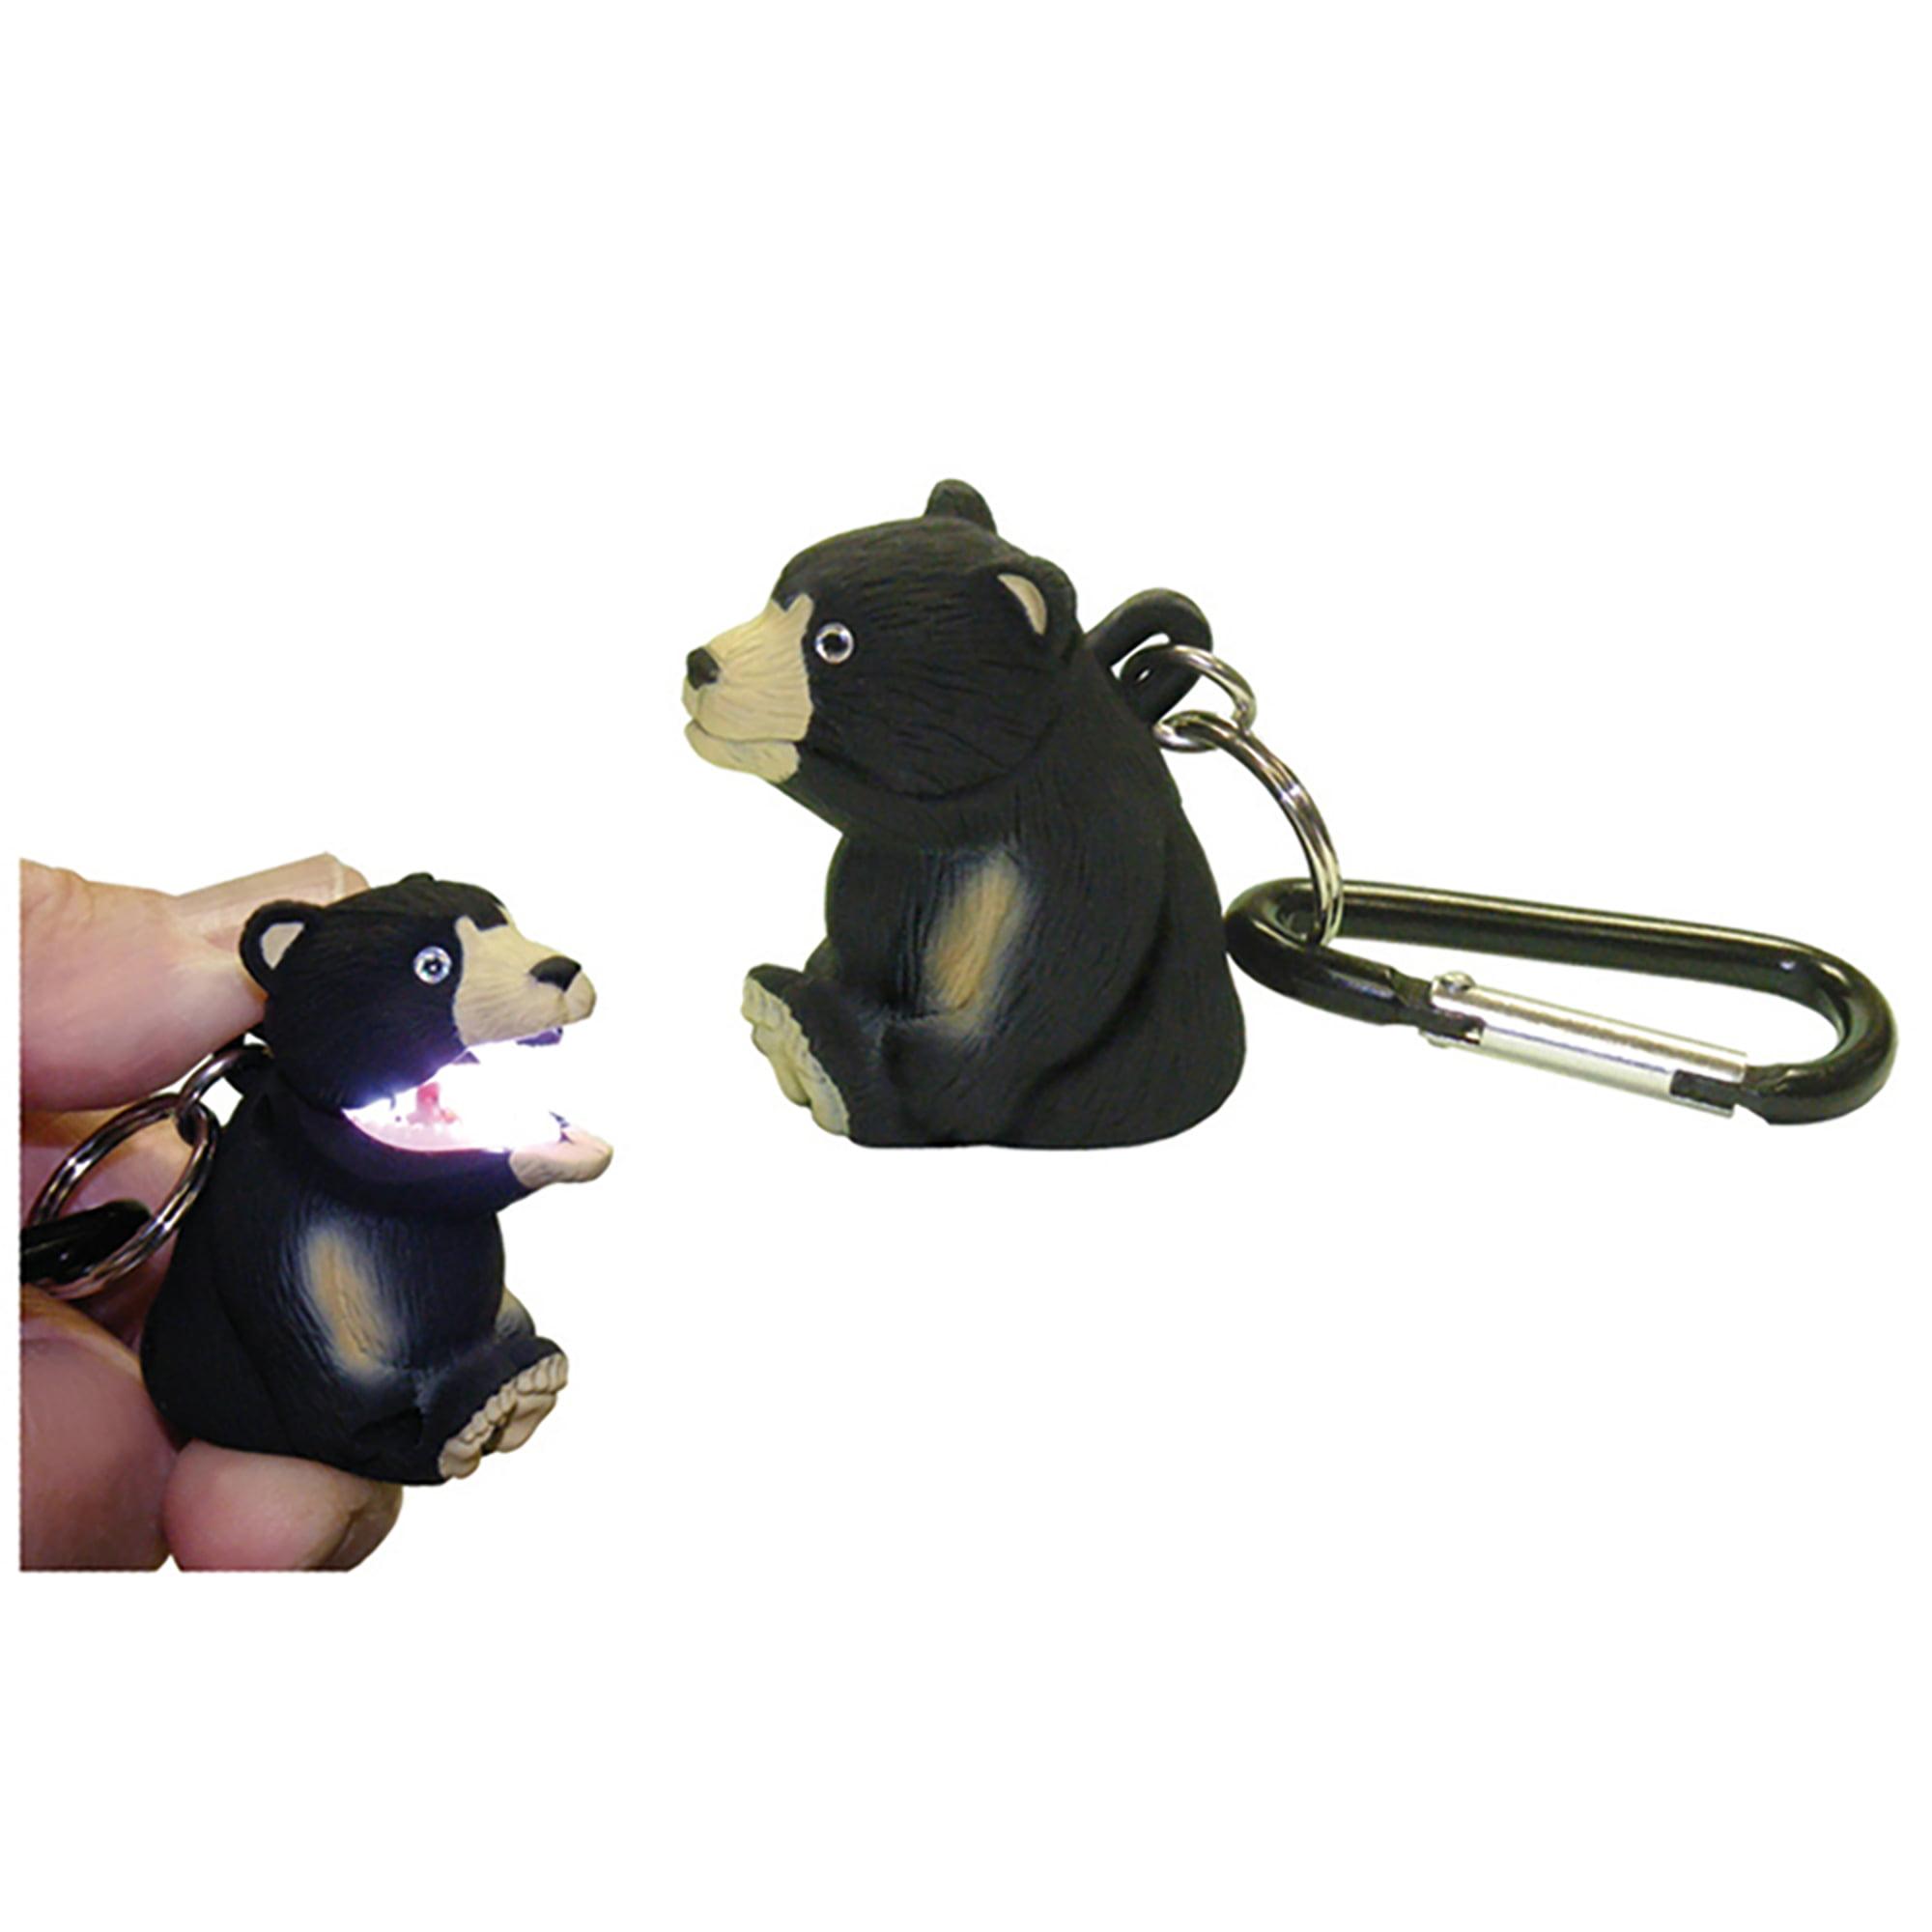 Wildlight Animal Carabiner Flashlight - Black Bear  a9537bb4b